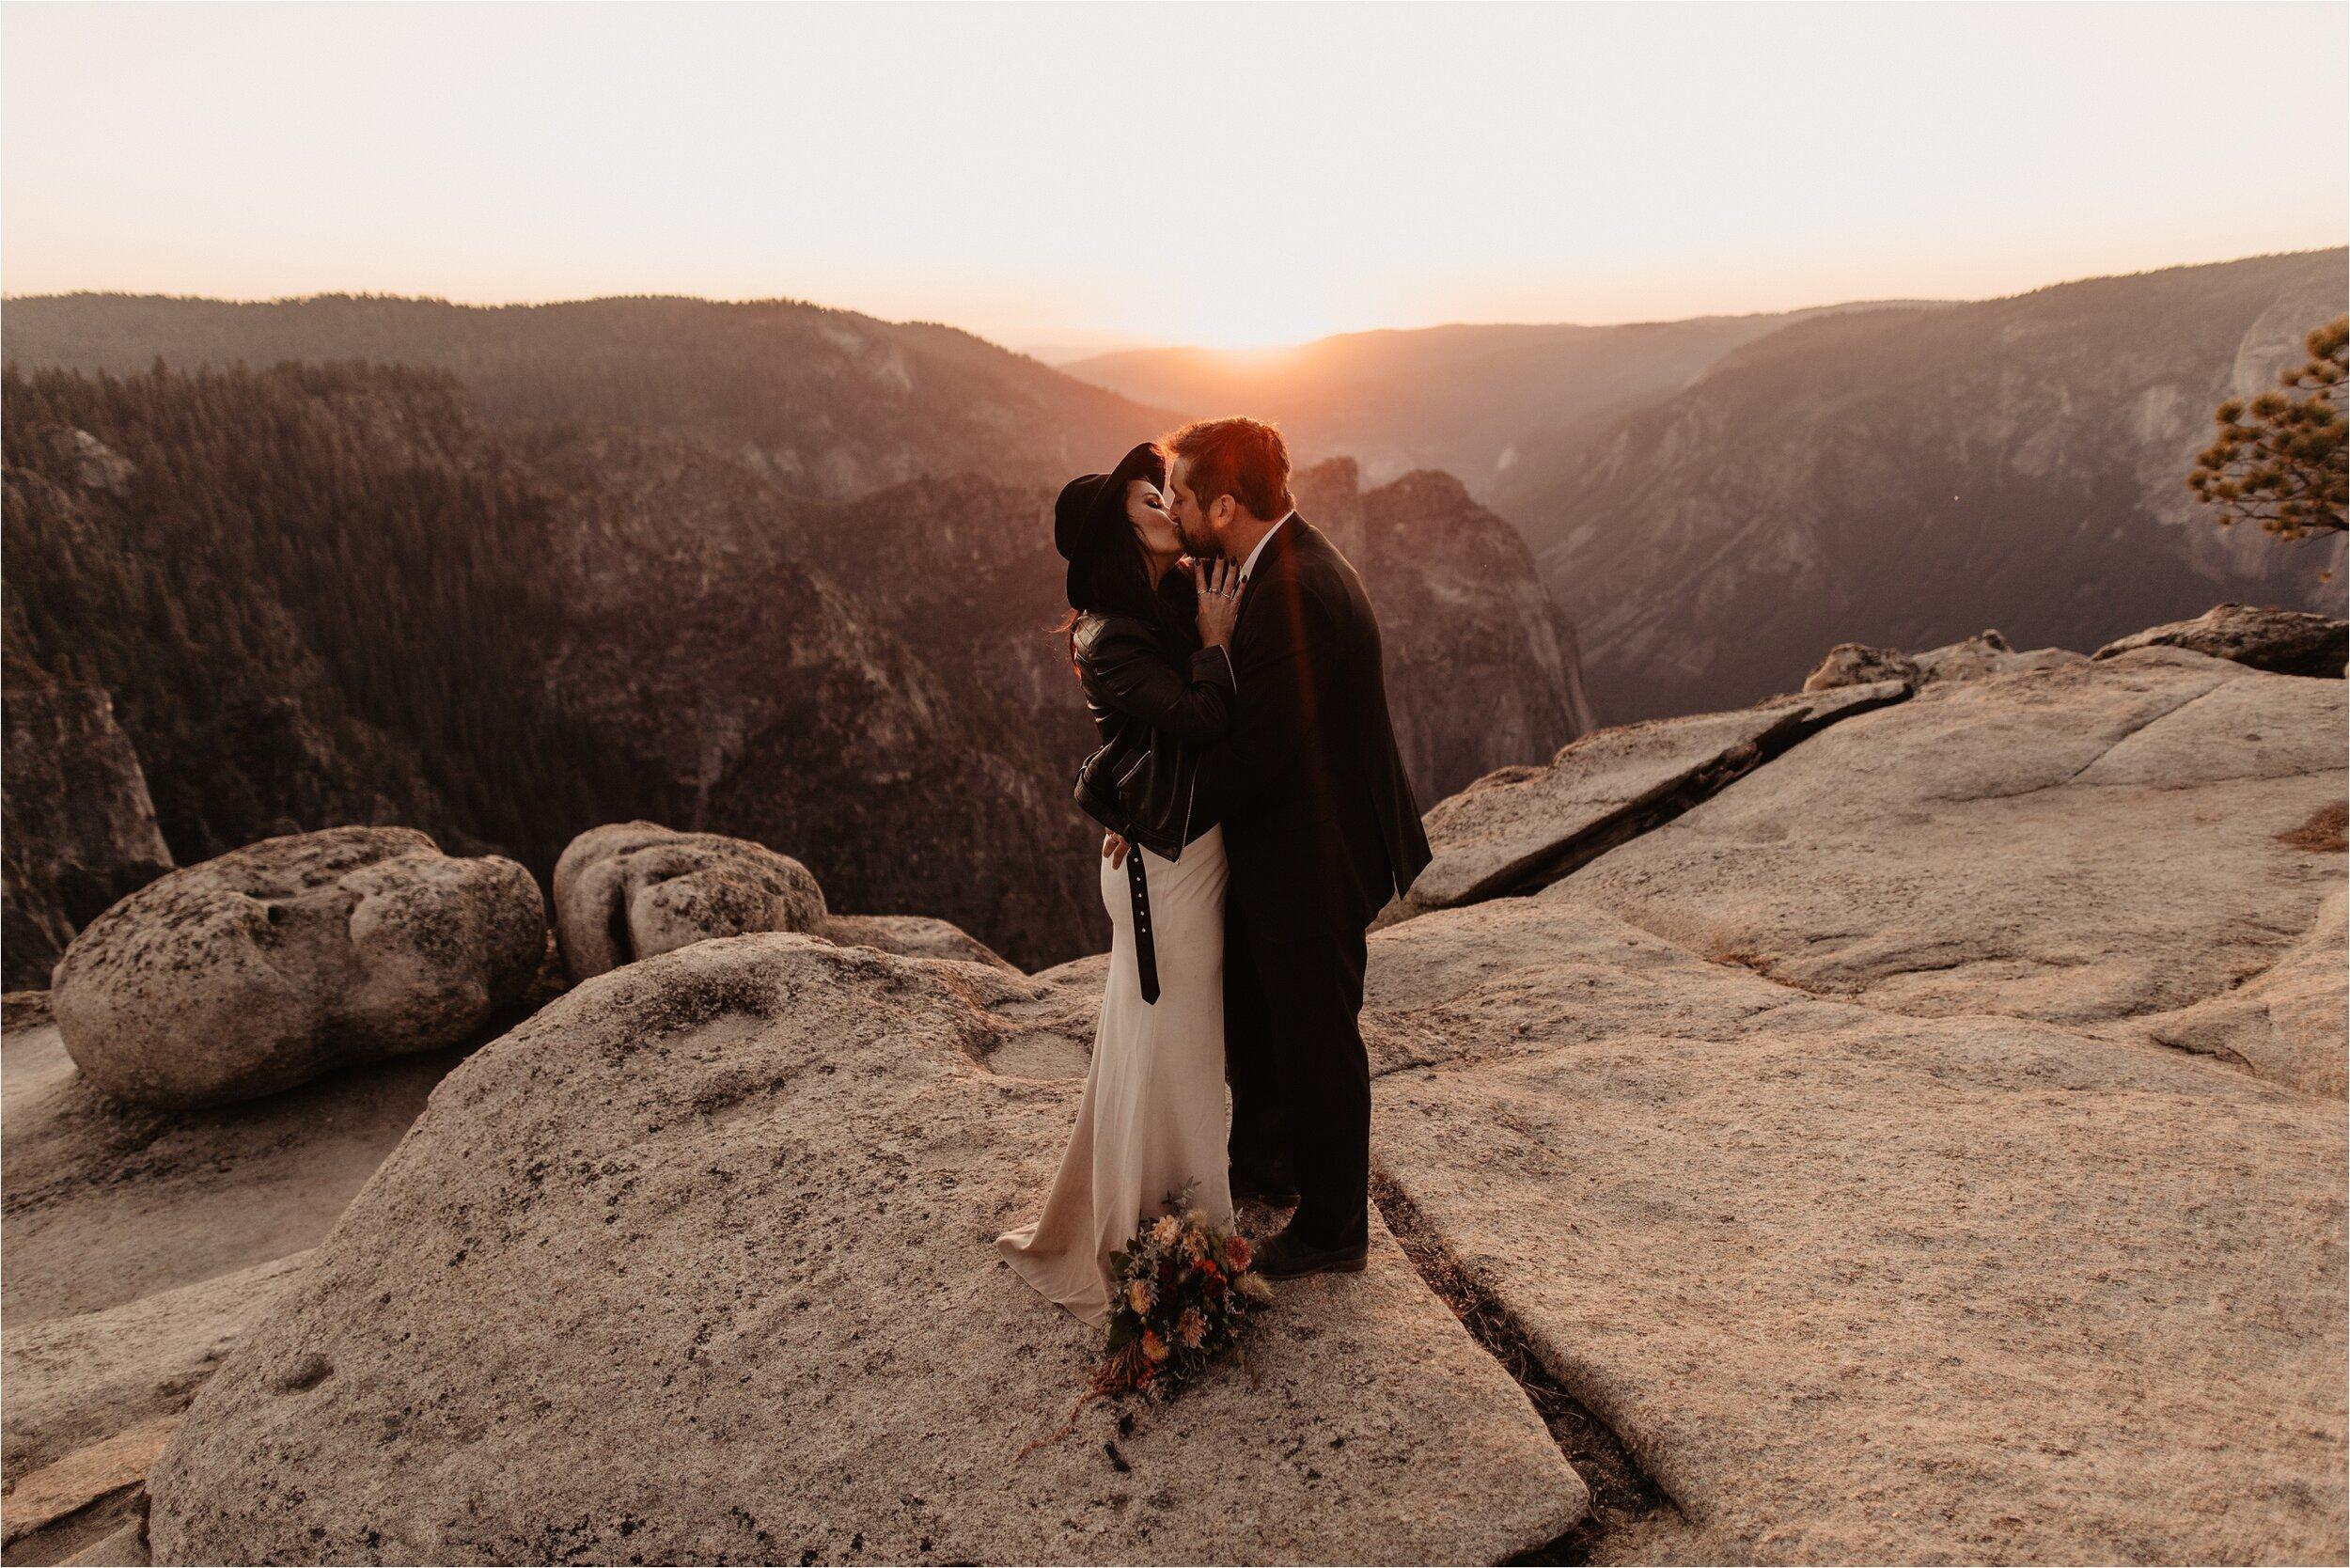 glacier-point-yosemite-elopement-ceremony_0082.jpg